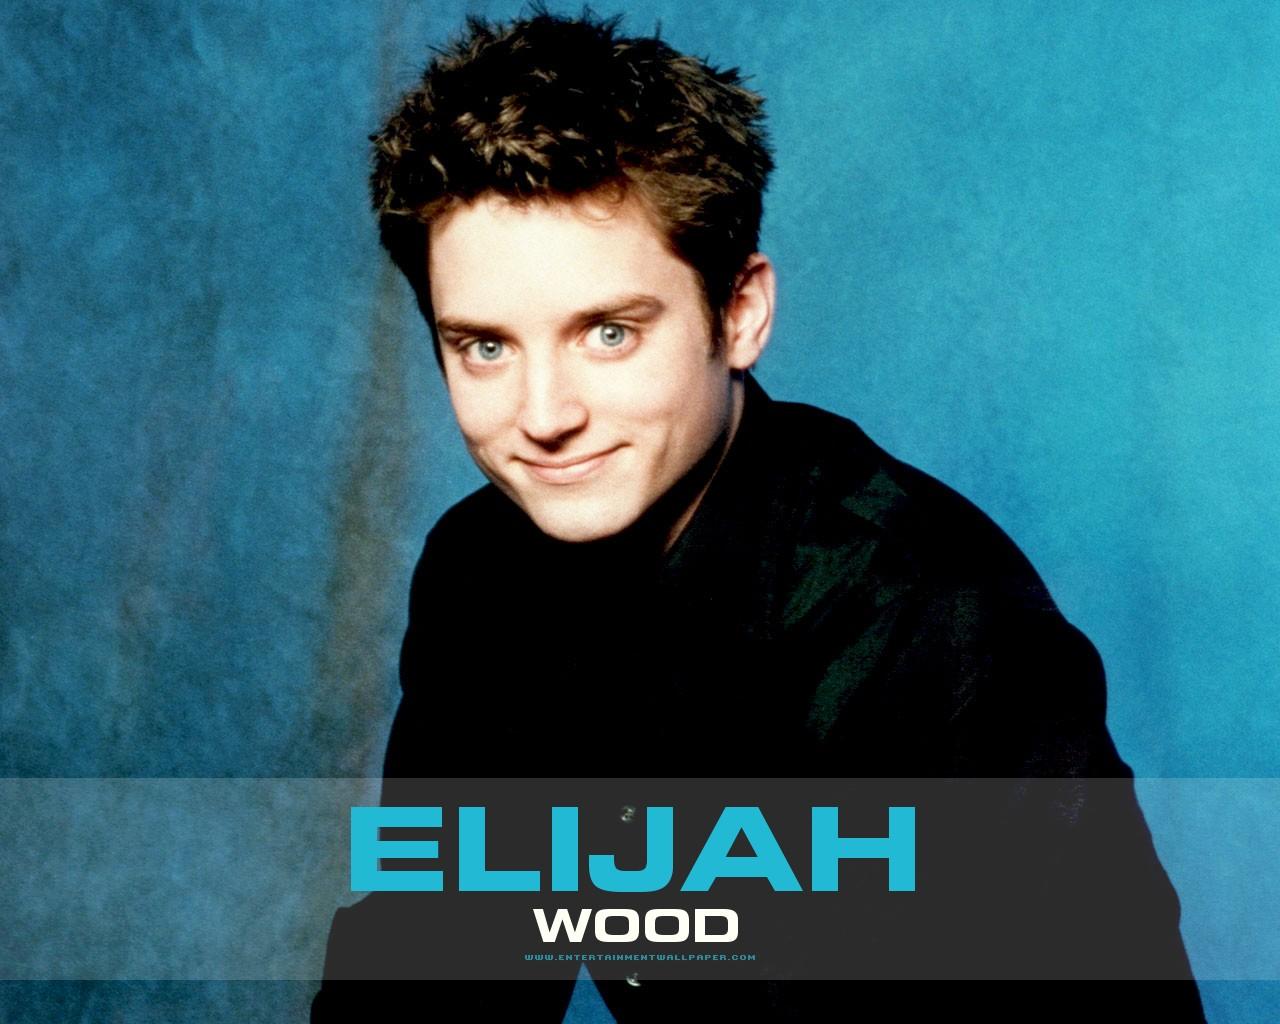 Elijah Wood wallpaper 1280x1024 49330 1280x1024